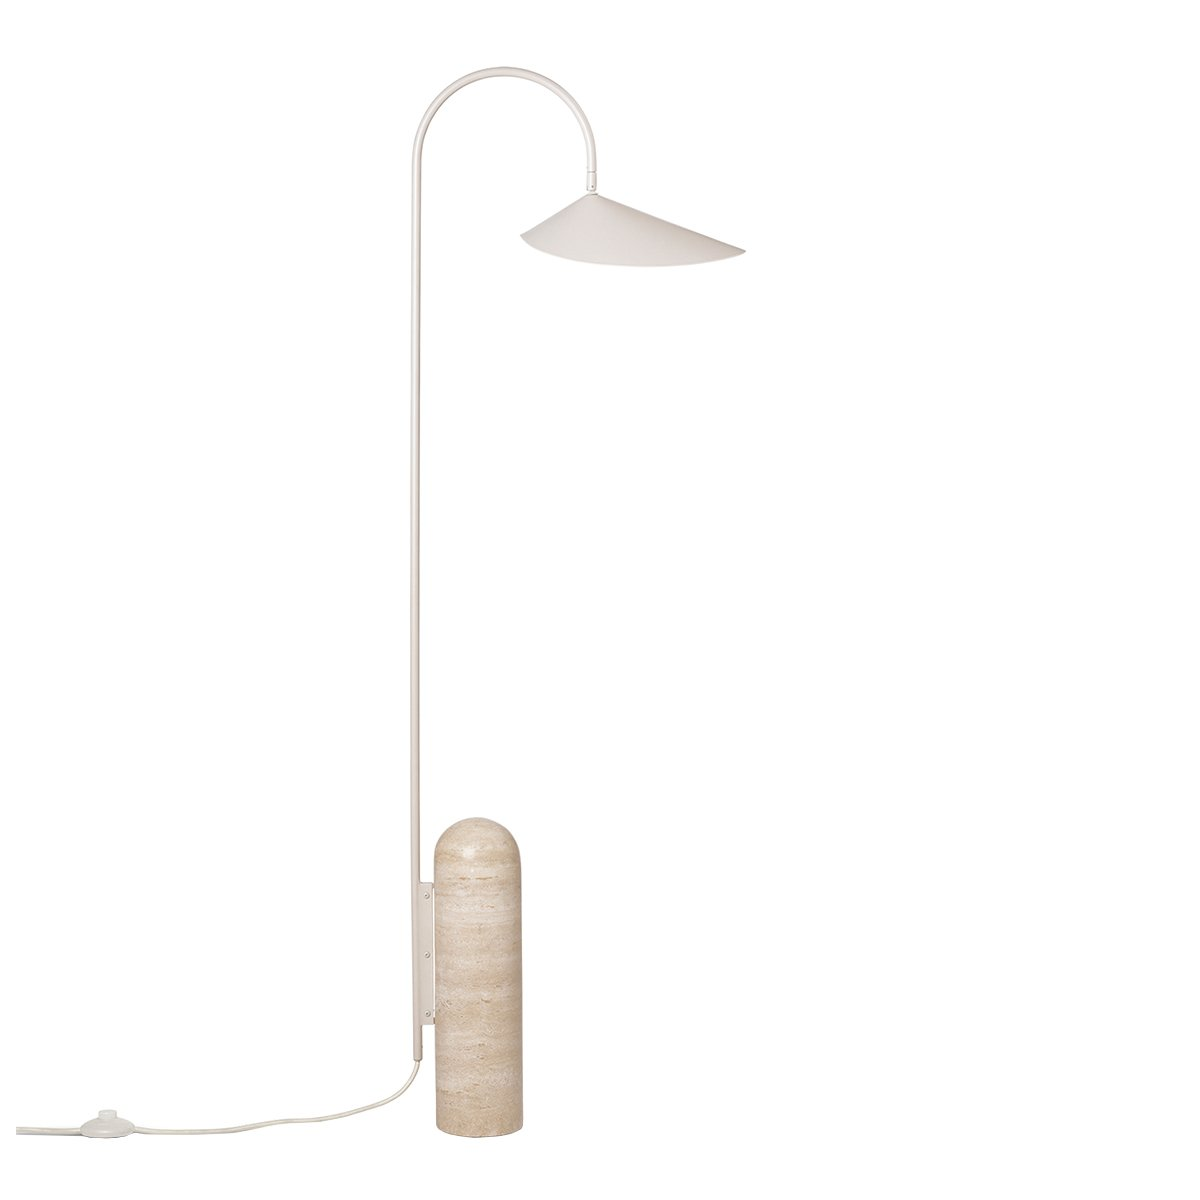 Ferm Living Arum Vloerlamp - Cashmere